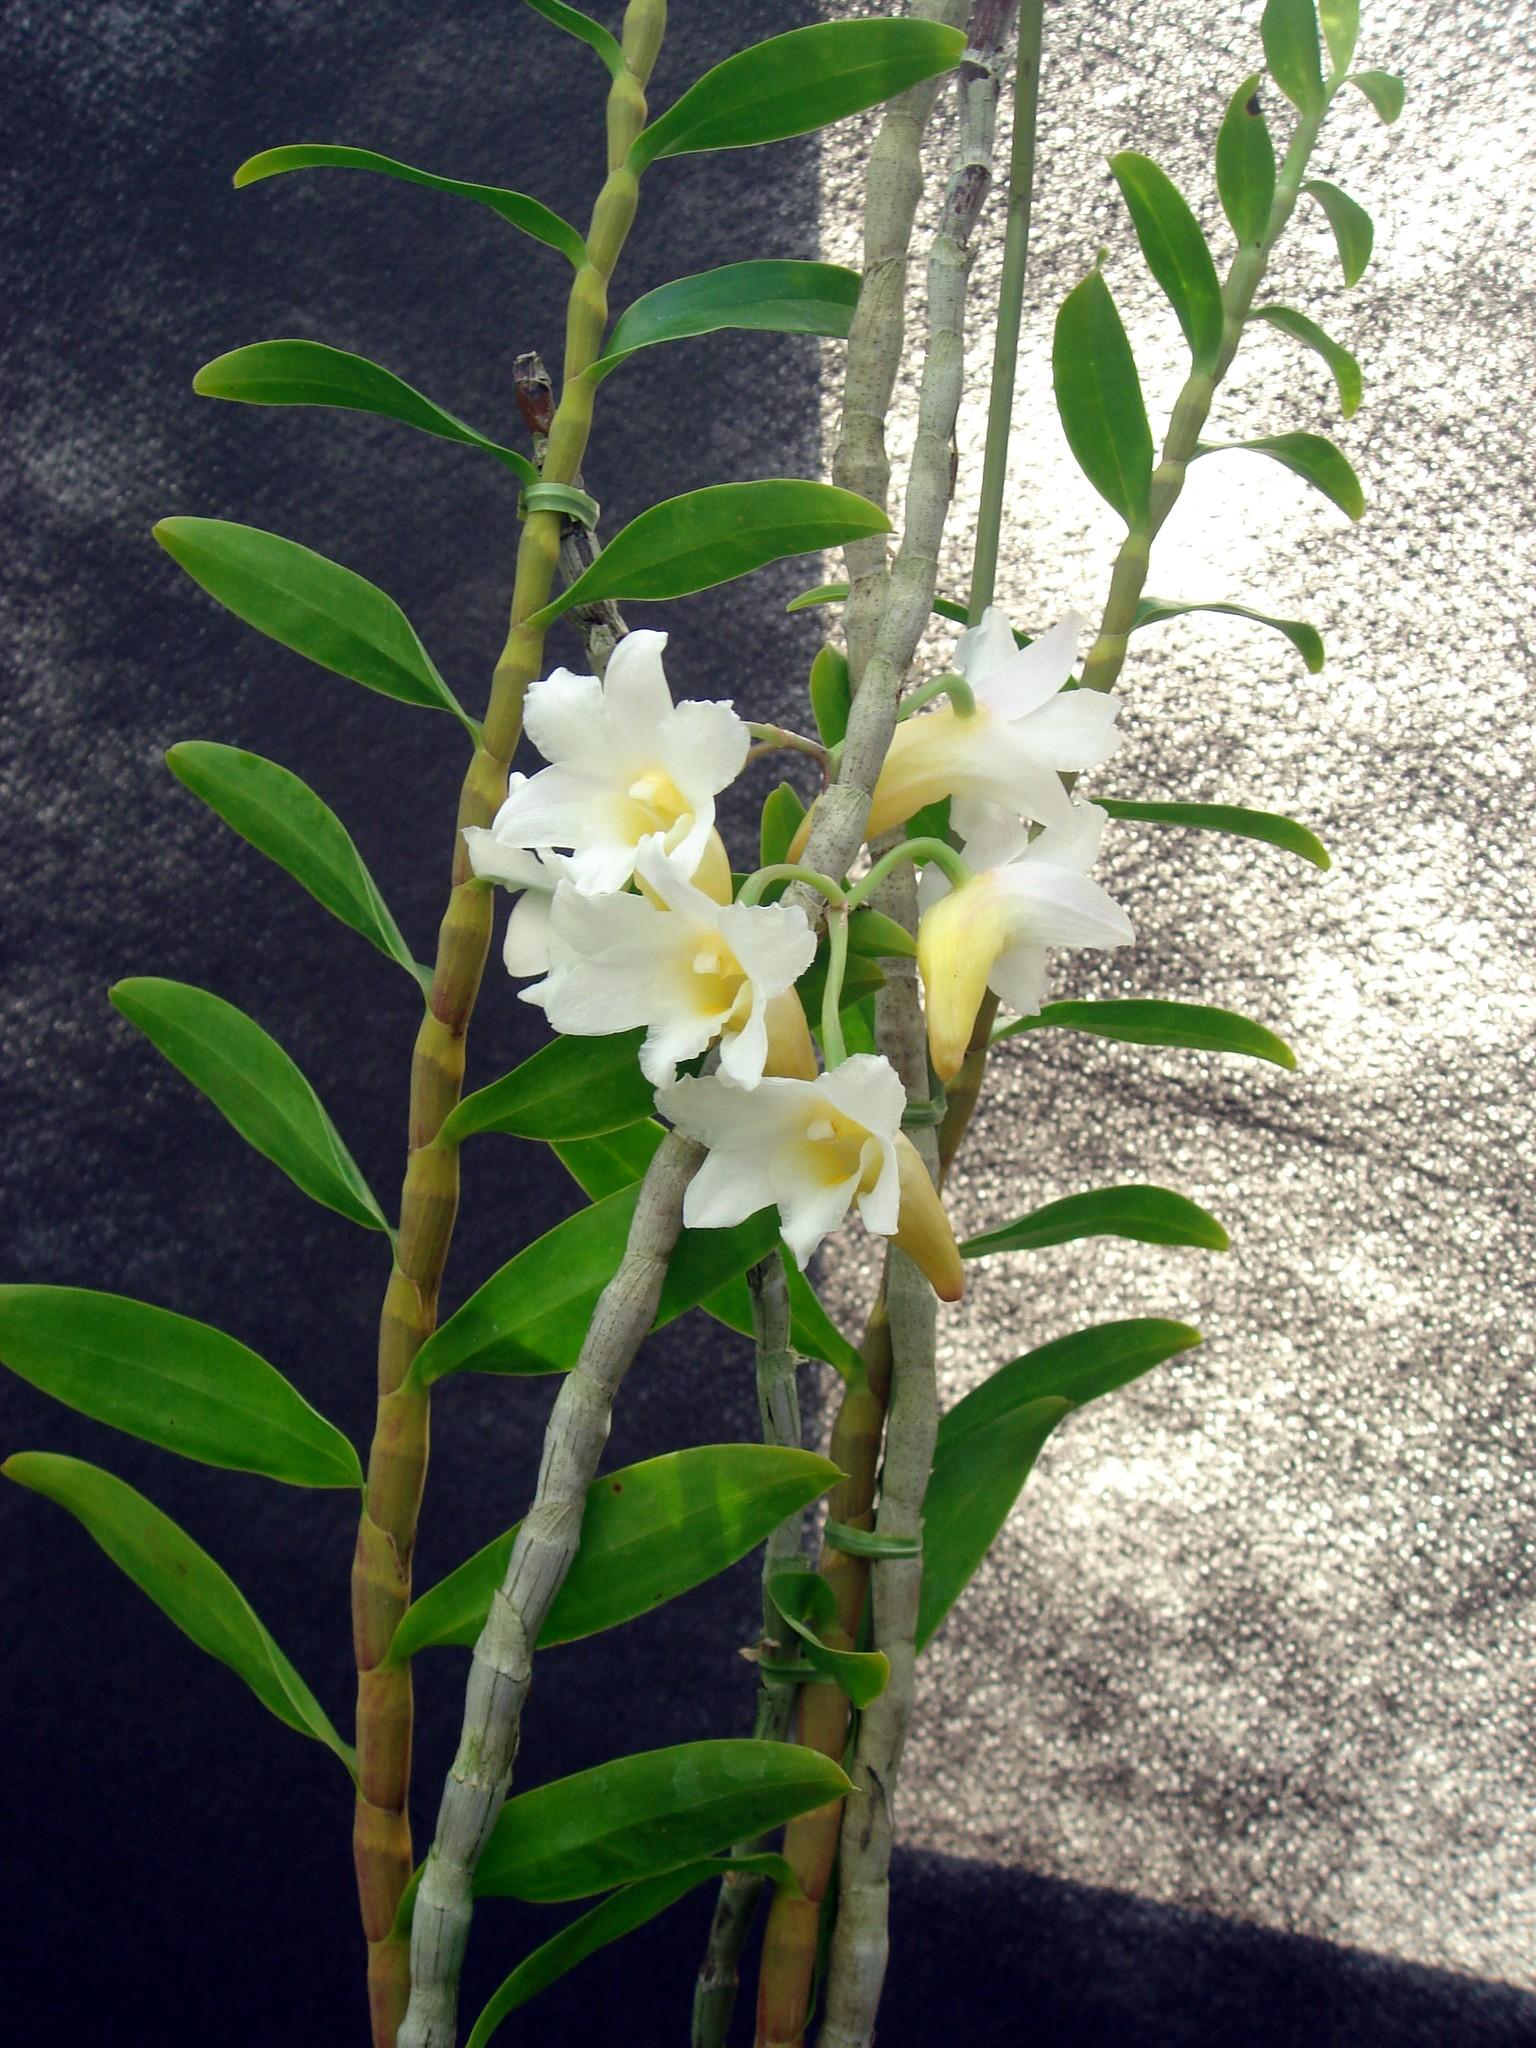 http://orchids.la.coocan.jp/Dendrobium/Dendrobium%20phillipsii/DSC09339.JPG